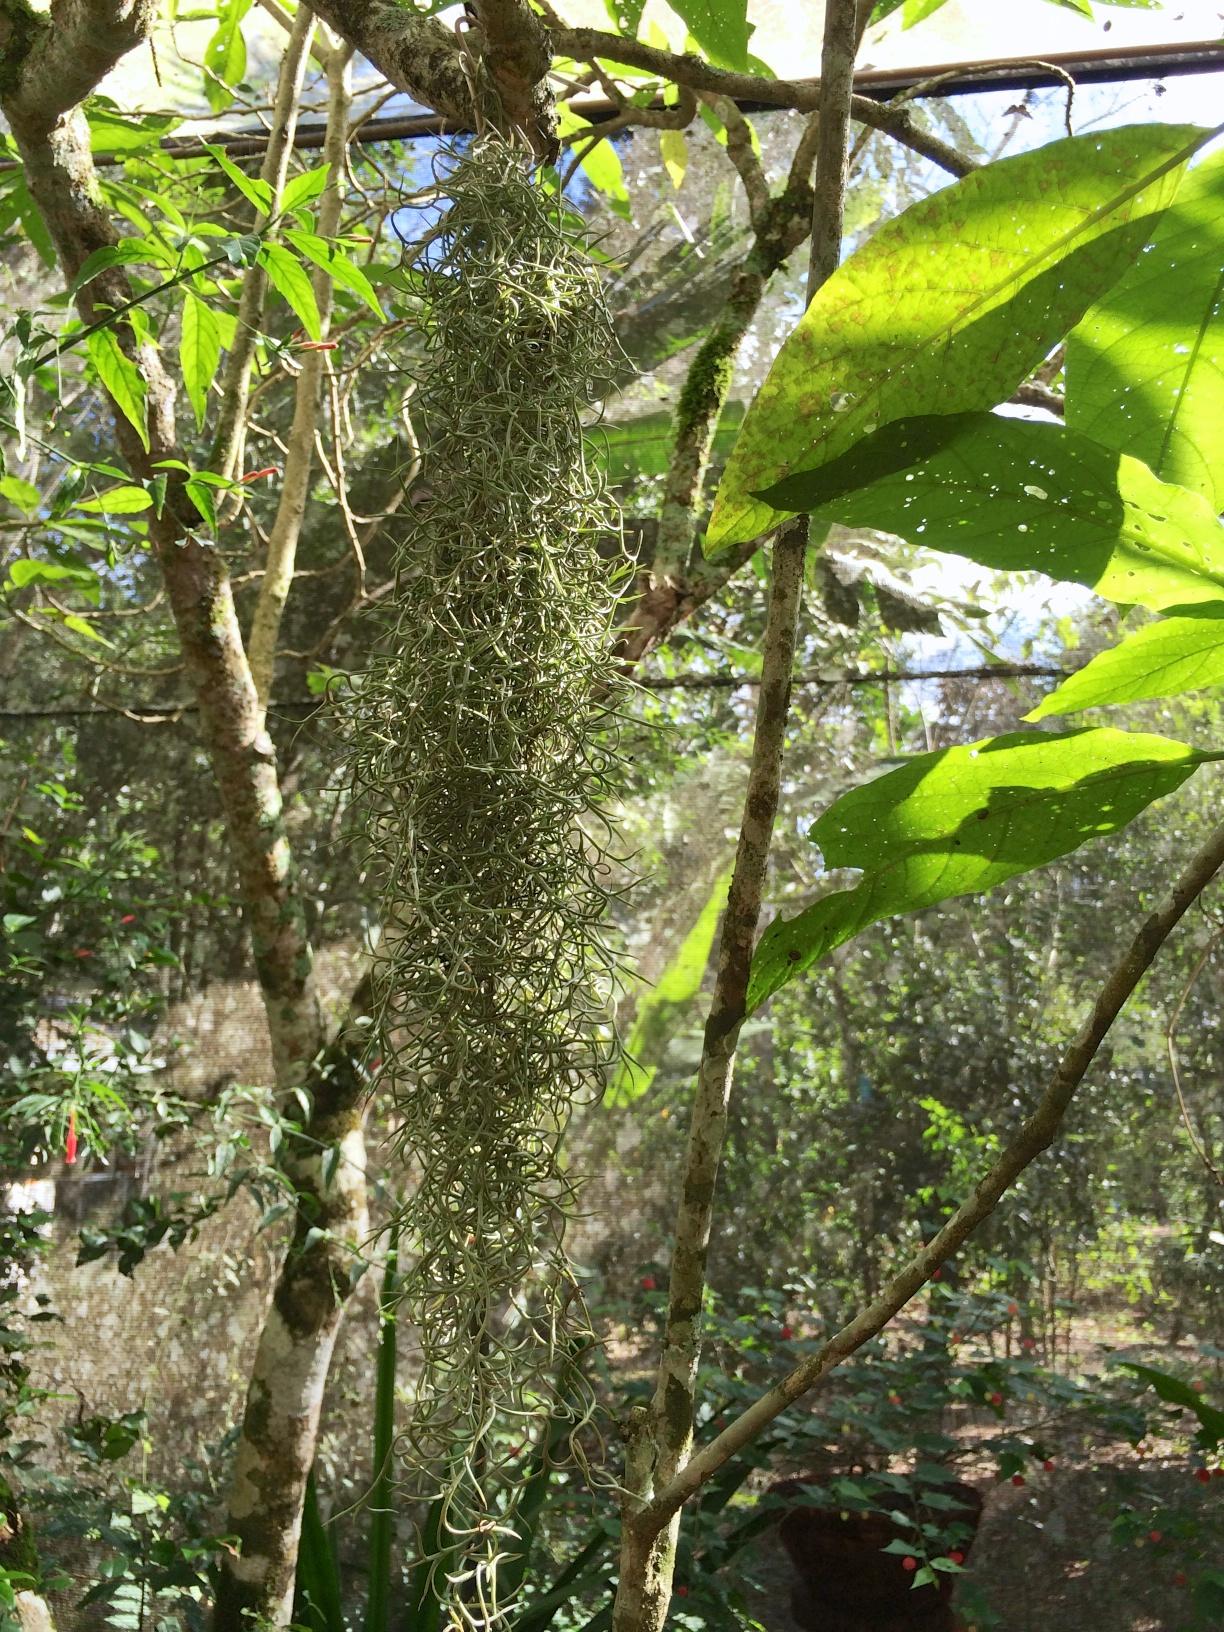 Bird Sanctuary, Foz do Iguacu, Brazil: Spanish Moss (Tilandsia usneoides) dripping gracefully from a branch